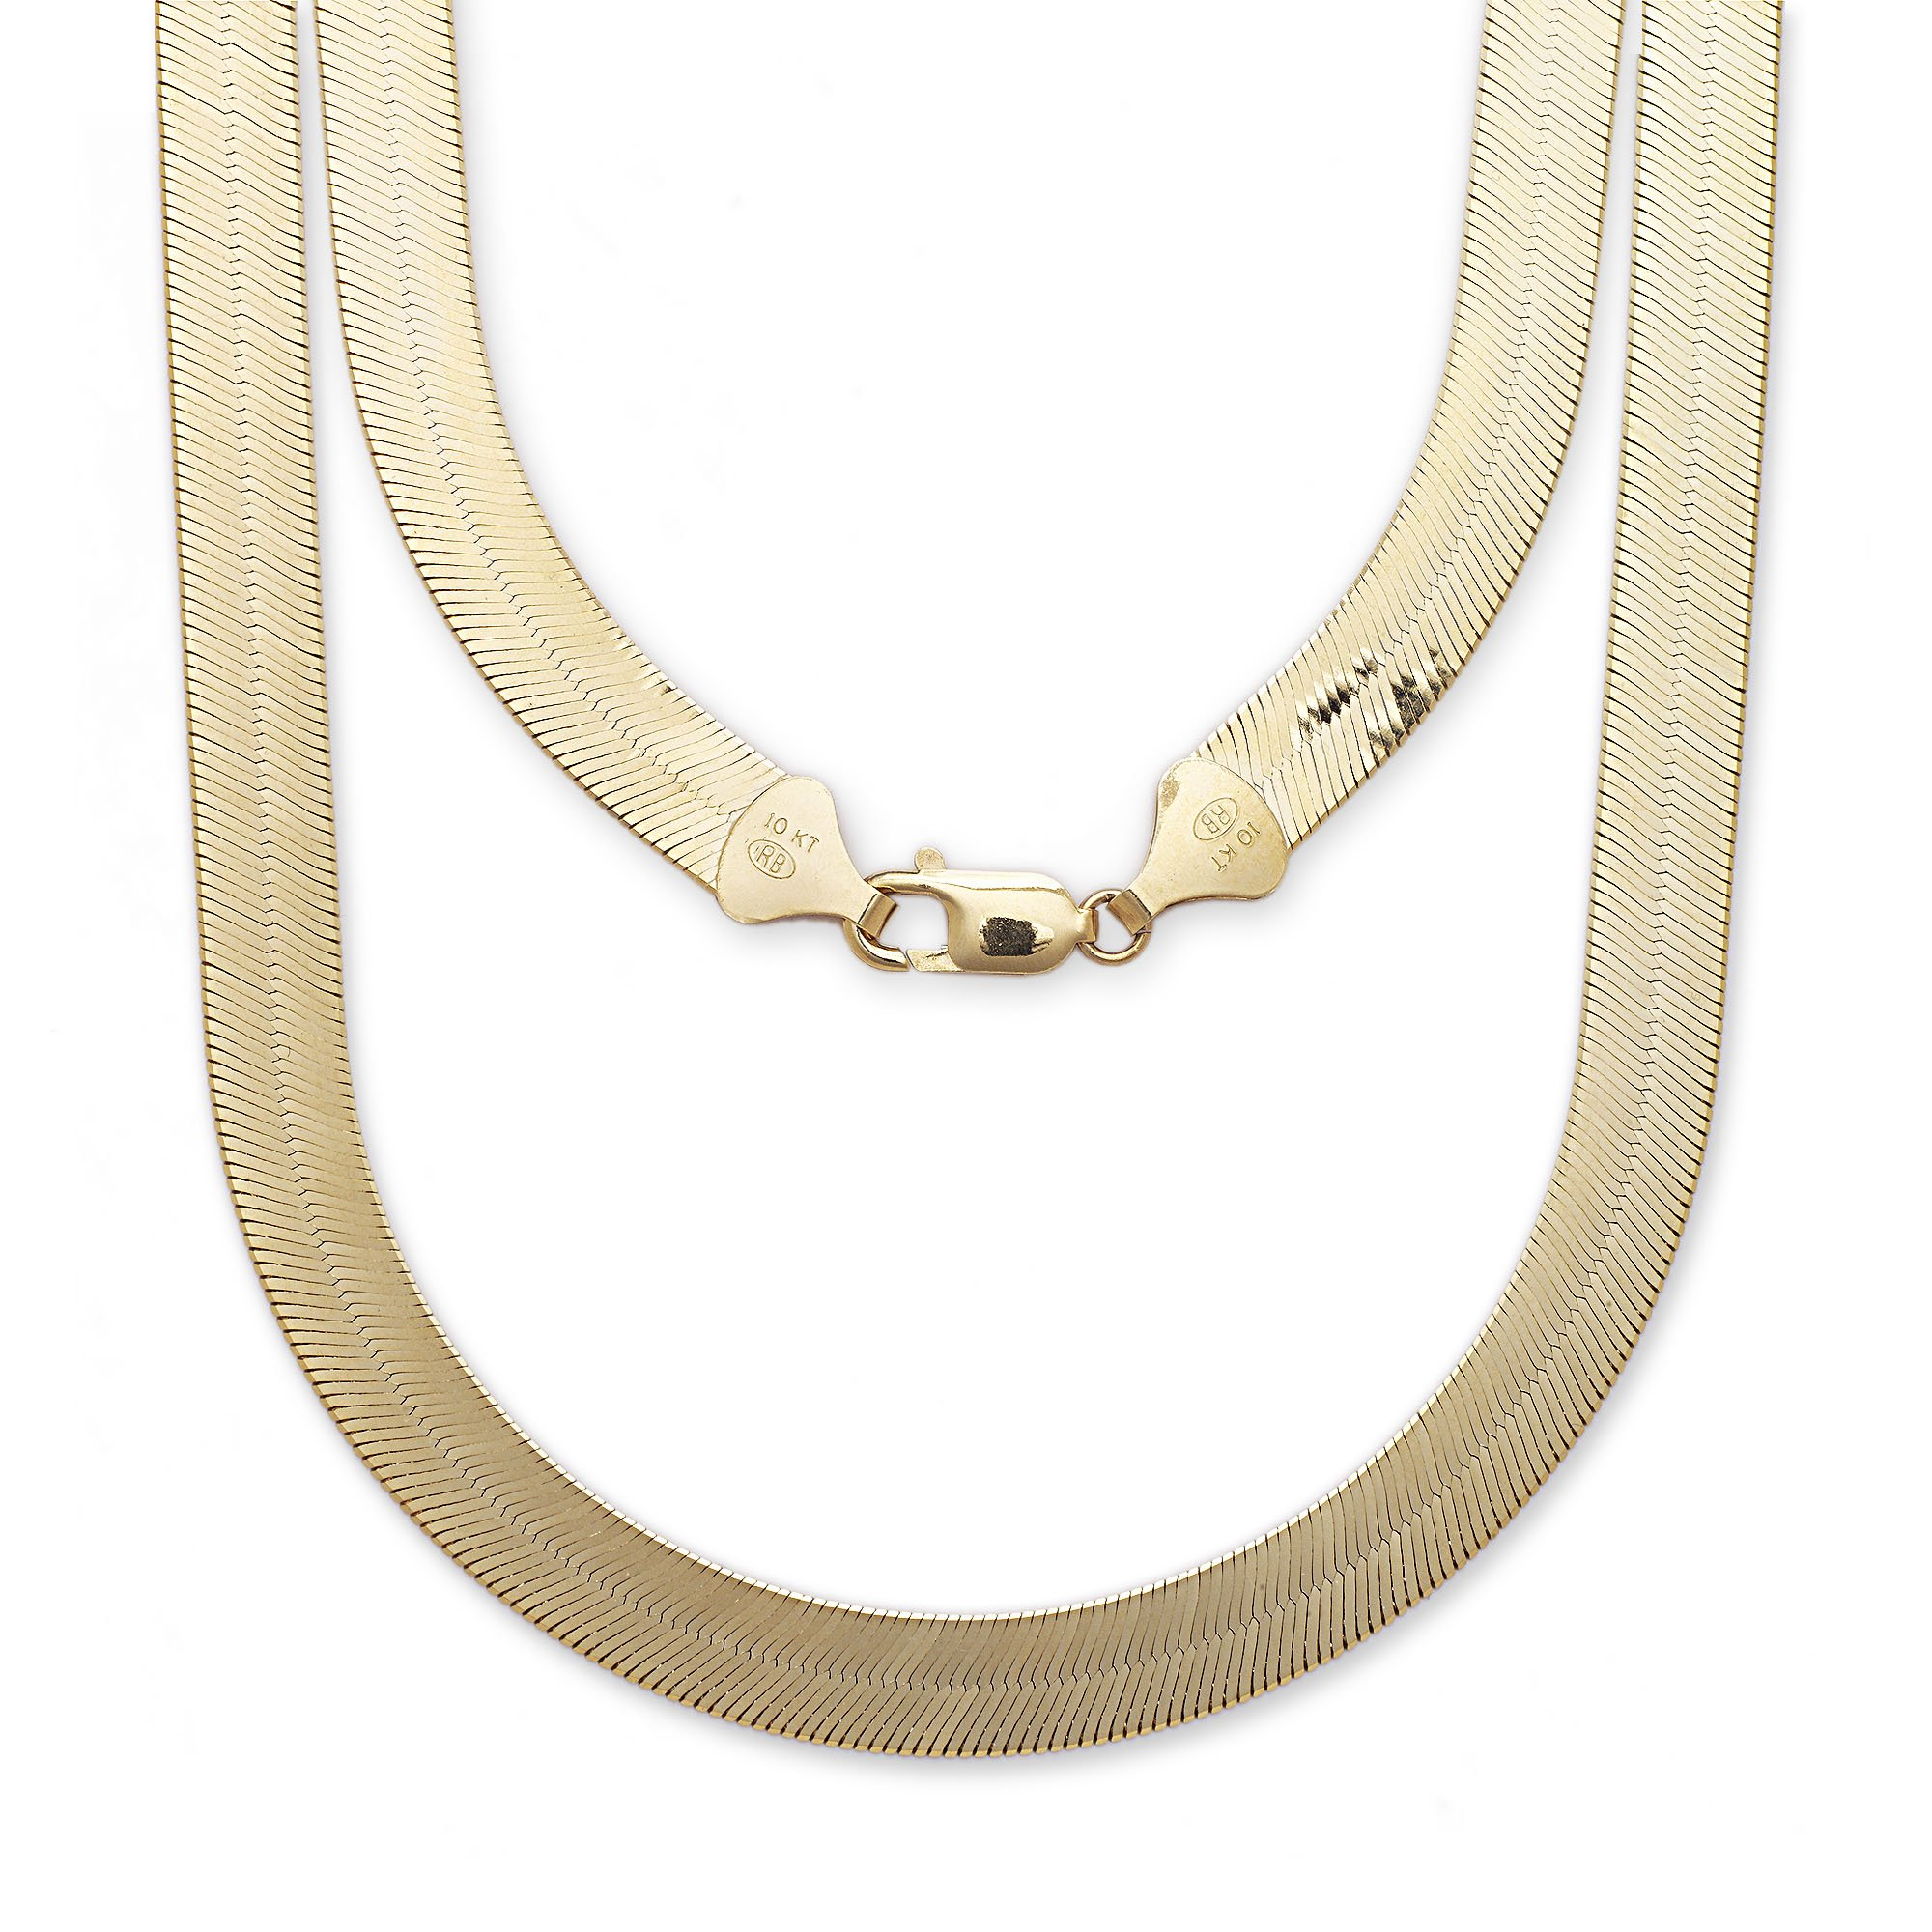 "Super Flexible Silky Herringbone Chain Necklace - 10k - 24'' - 0.5"" (12mm)"